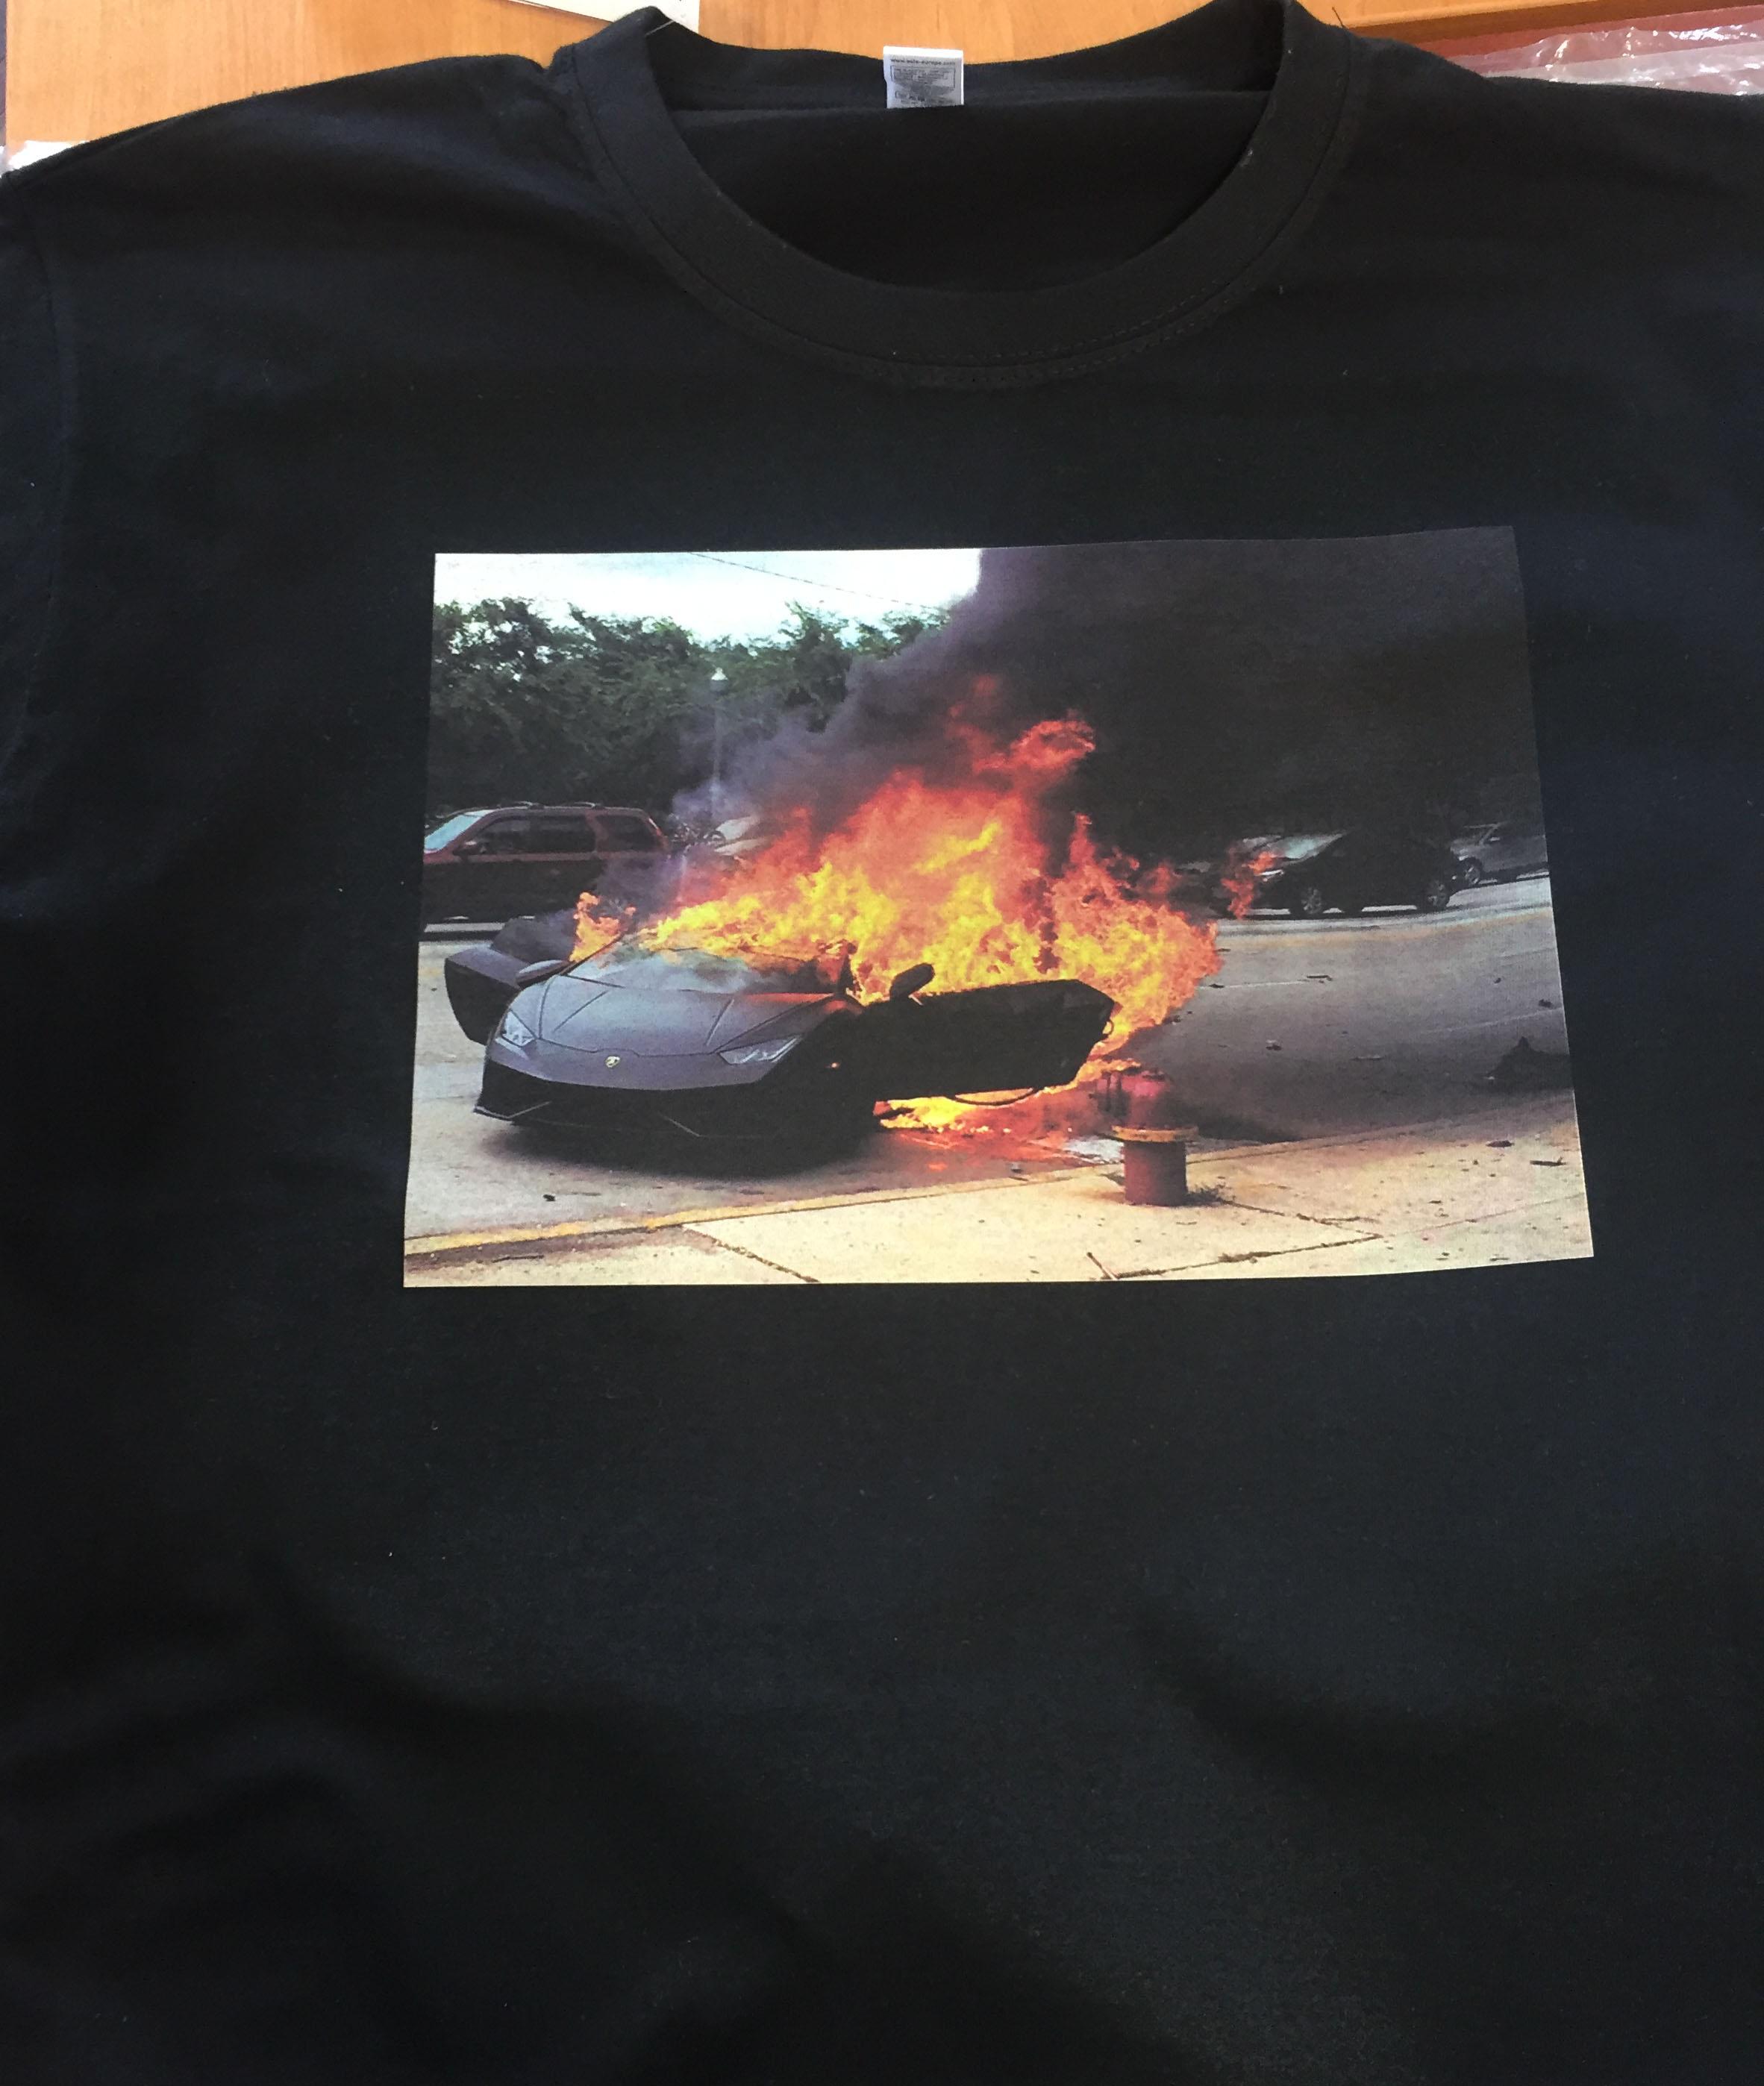 Фото Печать на футболках, худи, свитшотах и т.д. 4